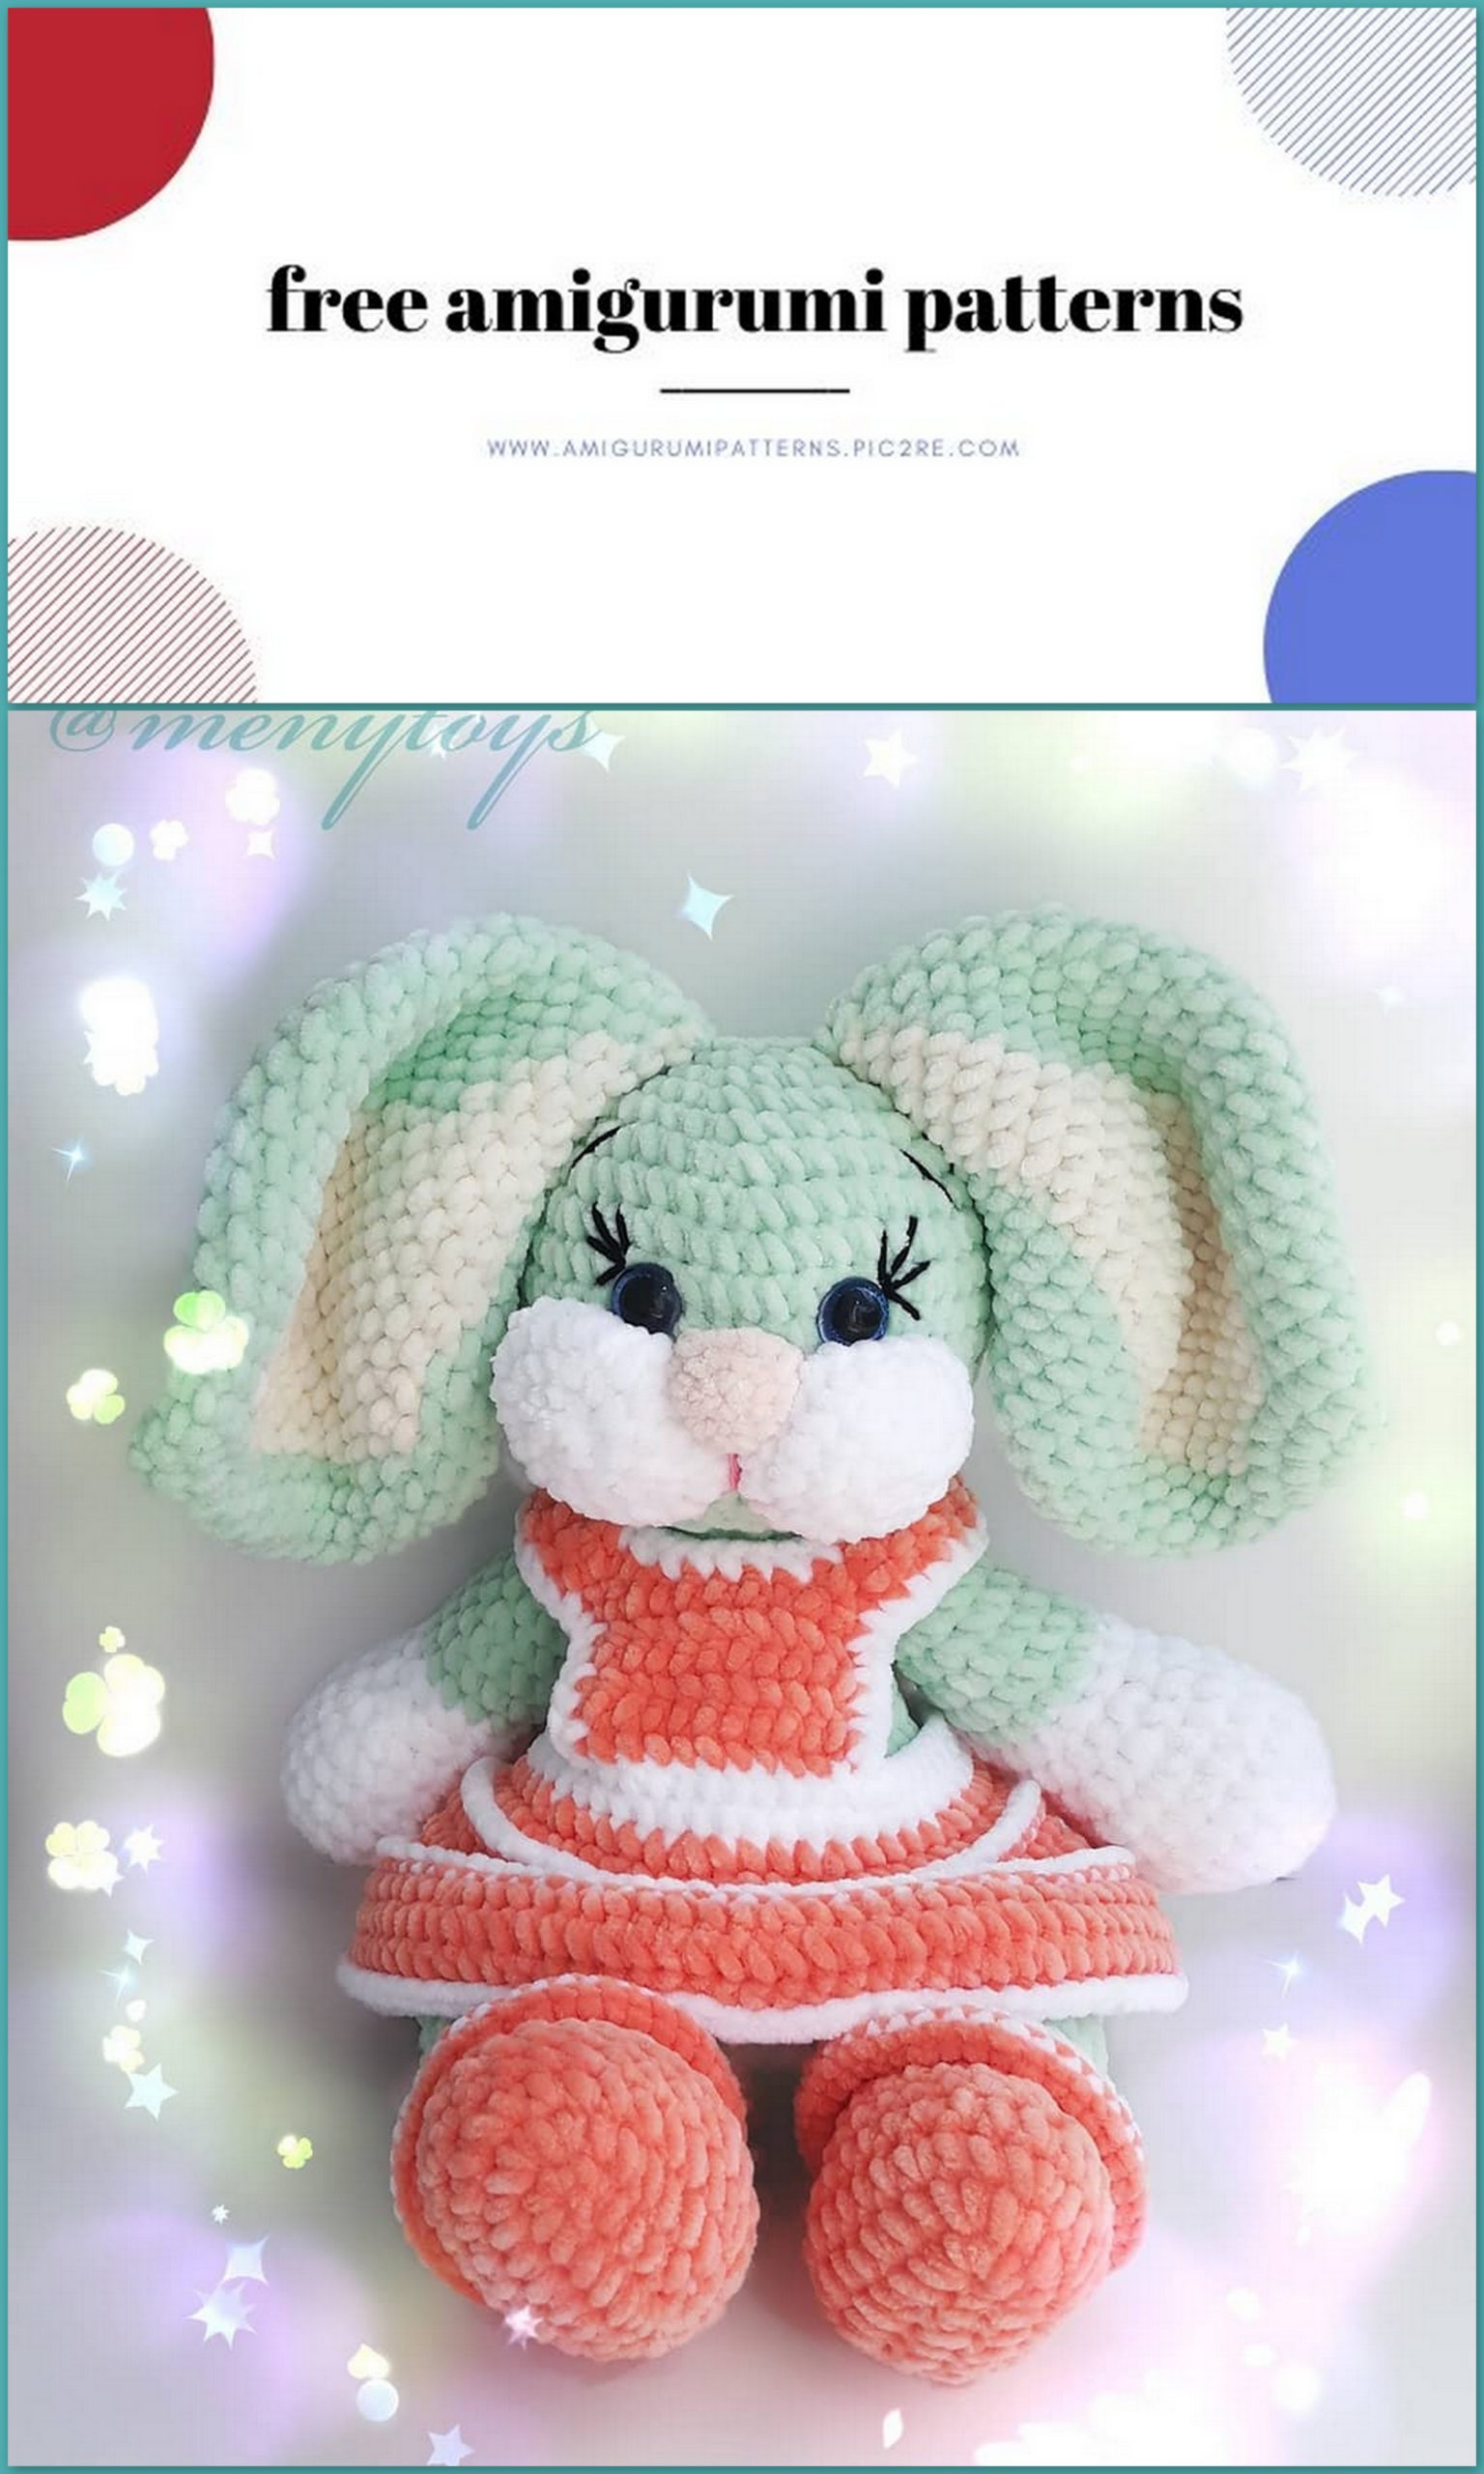 White rabbit amigurumi pattern - Amigurumi Today | 2560x1536